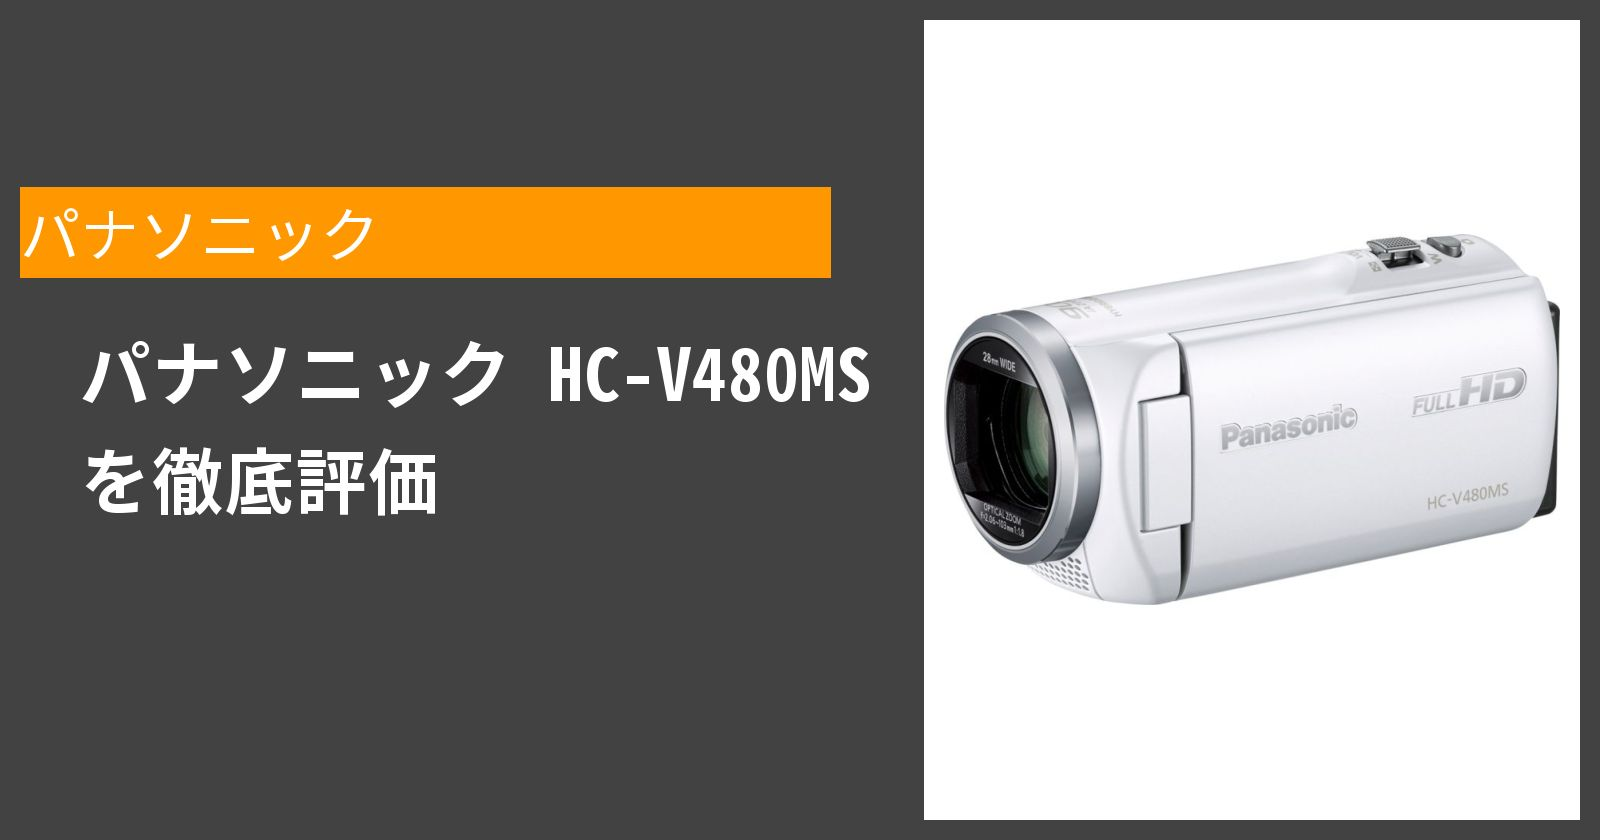 HC-V480MSを徹底評価